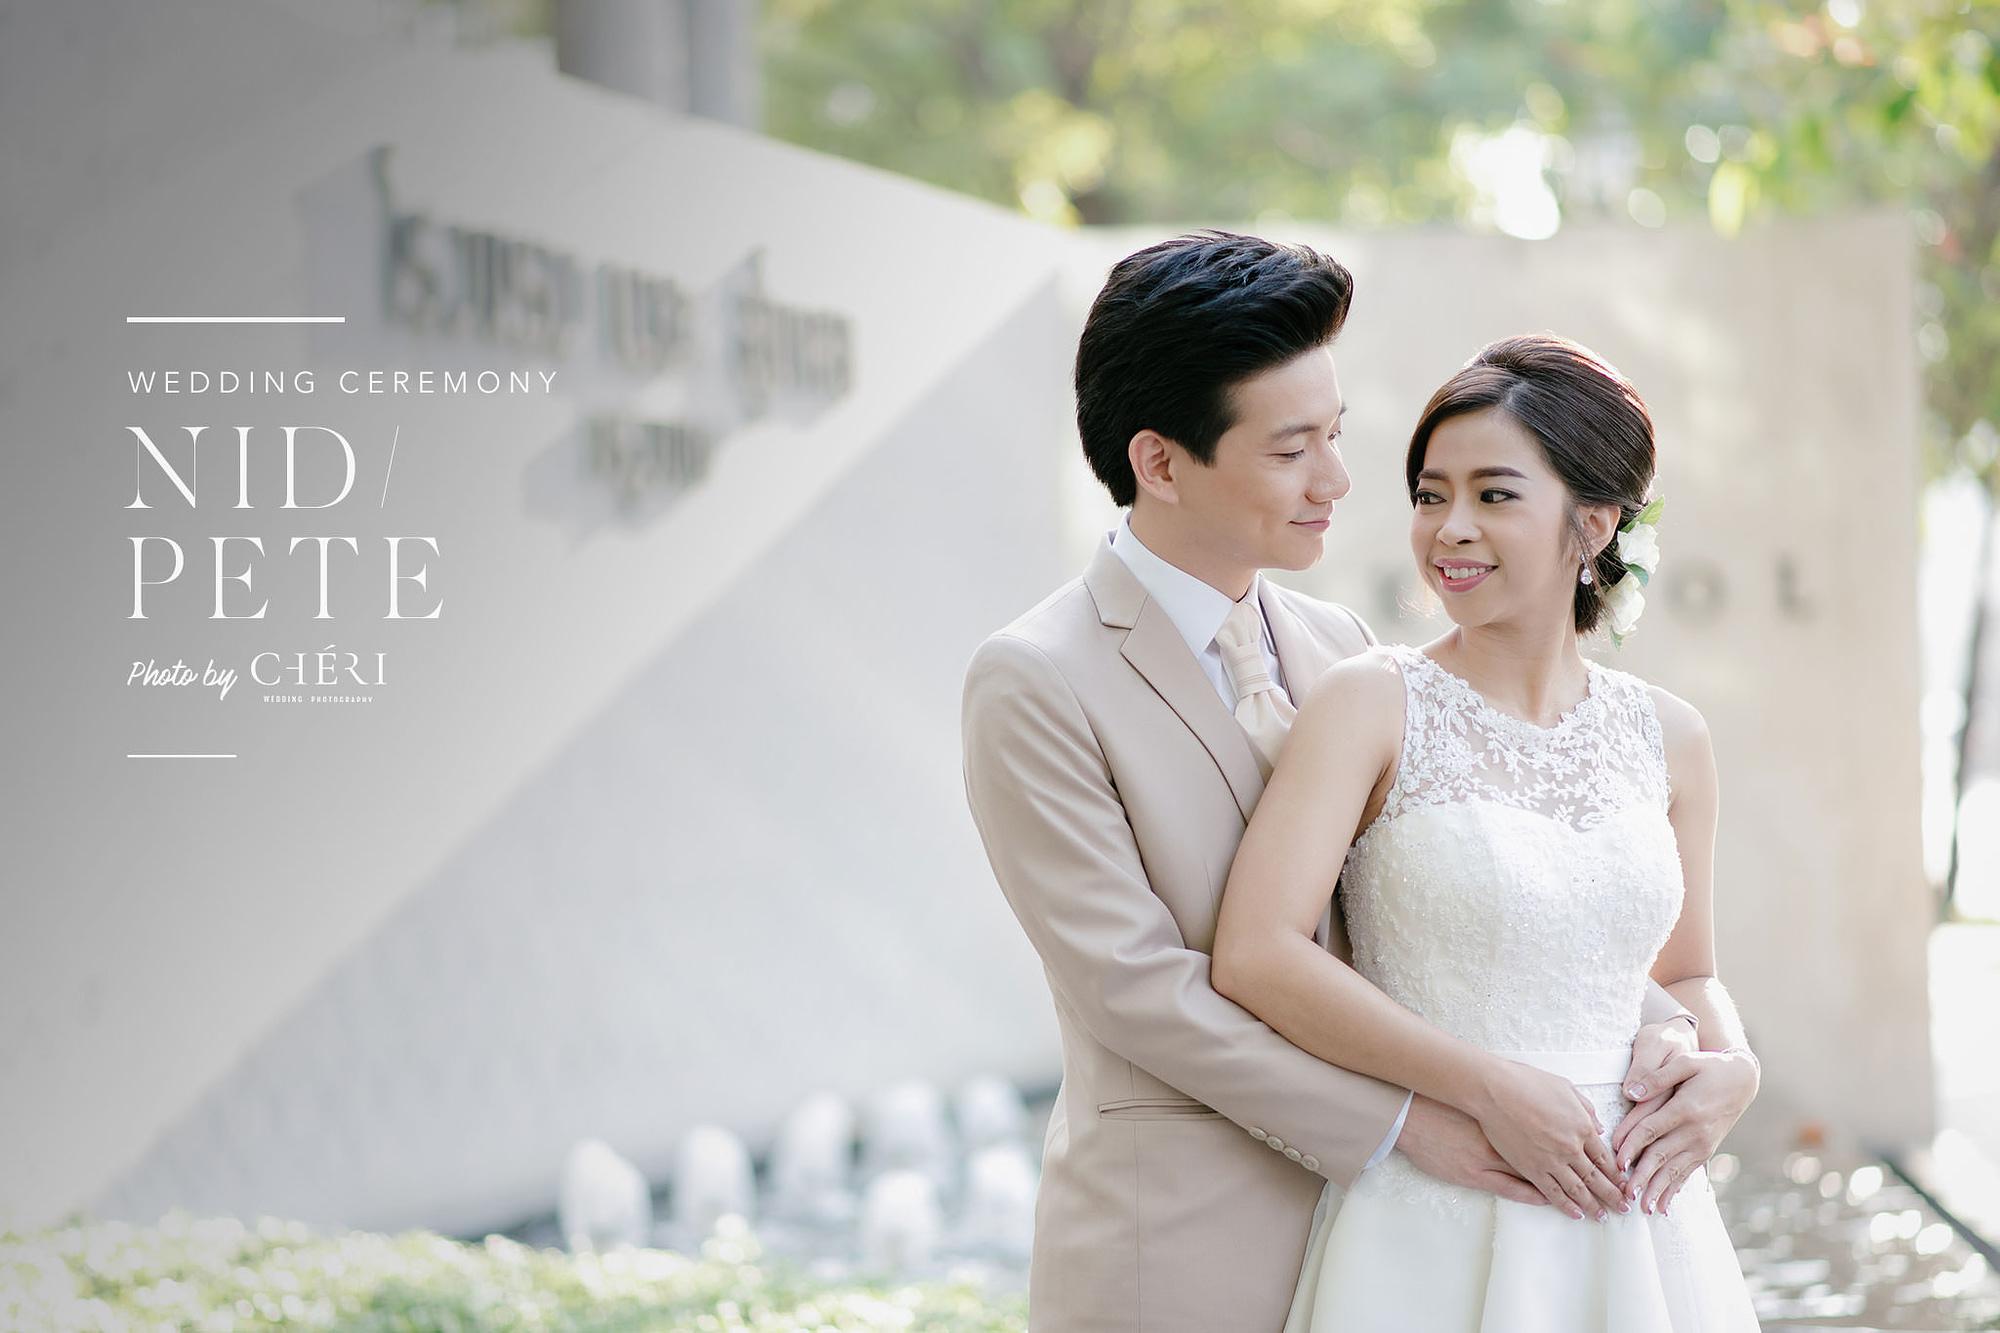 sukosol hotel bangkok wedding ceremony cover